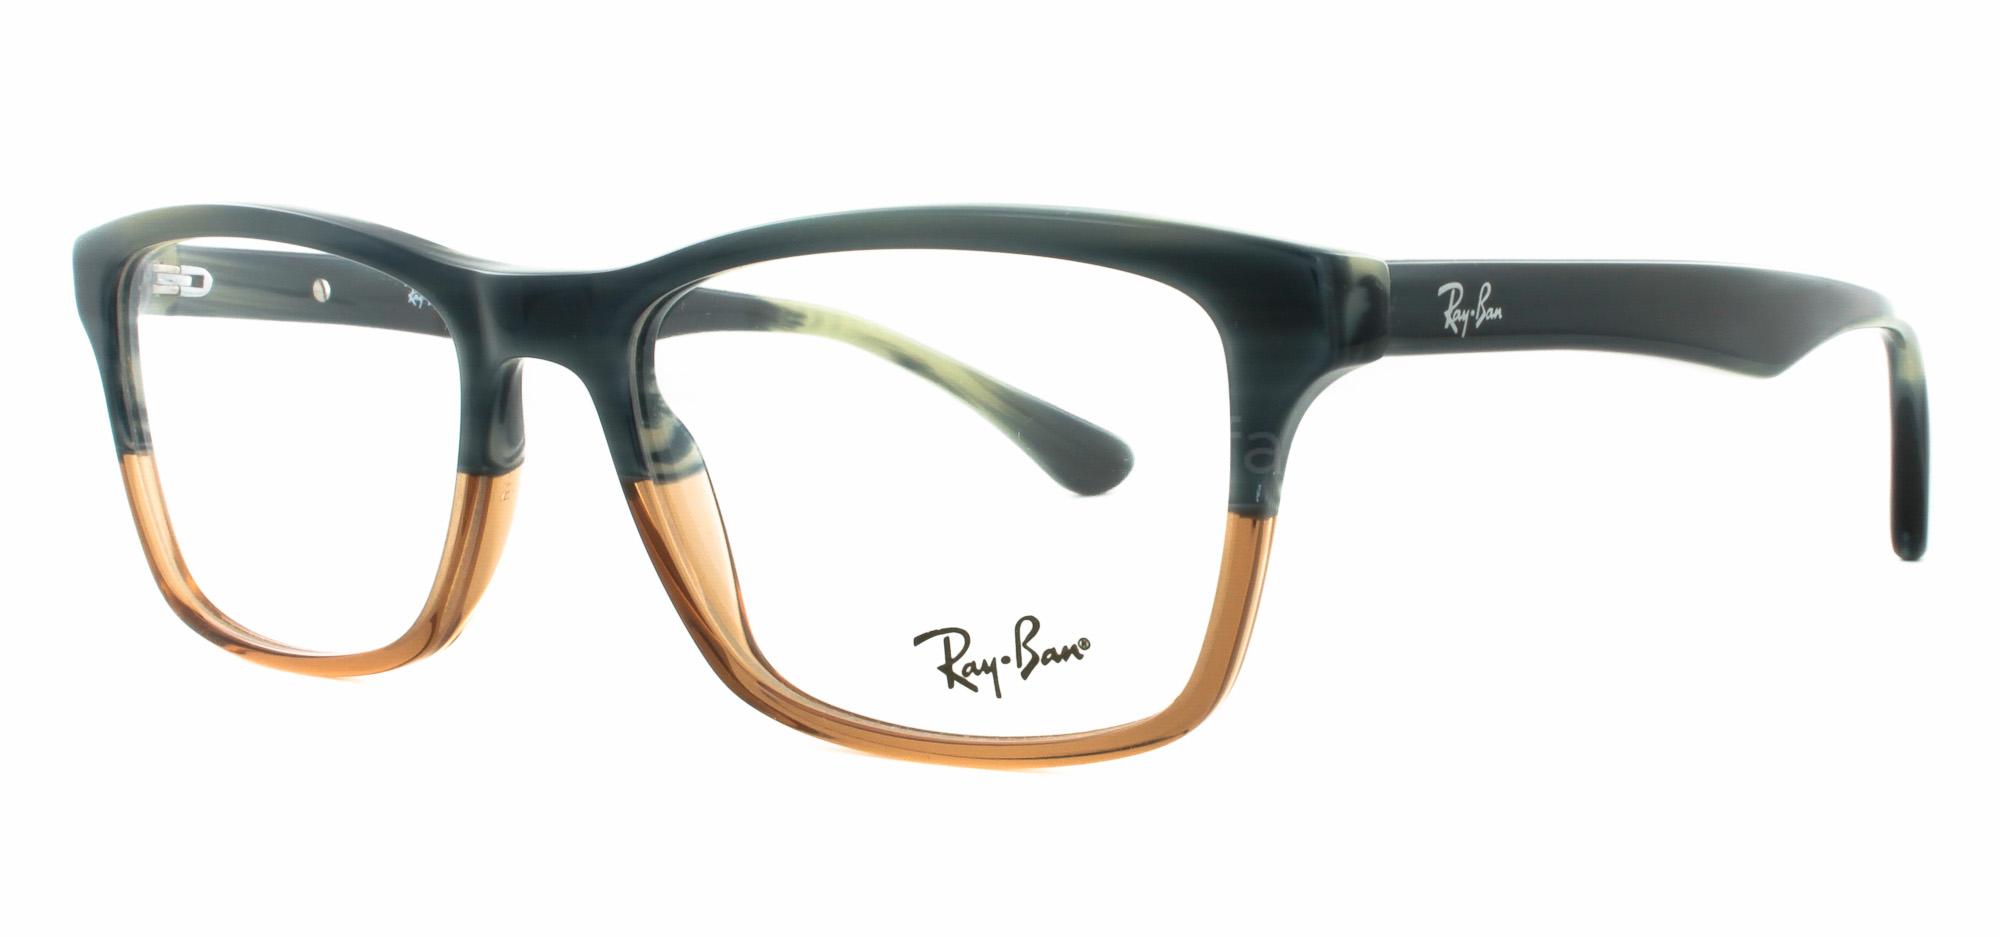 527d340c3b7 Ray Ban 5226 Eyeglasses In Brown « Heritage Malta